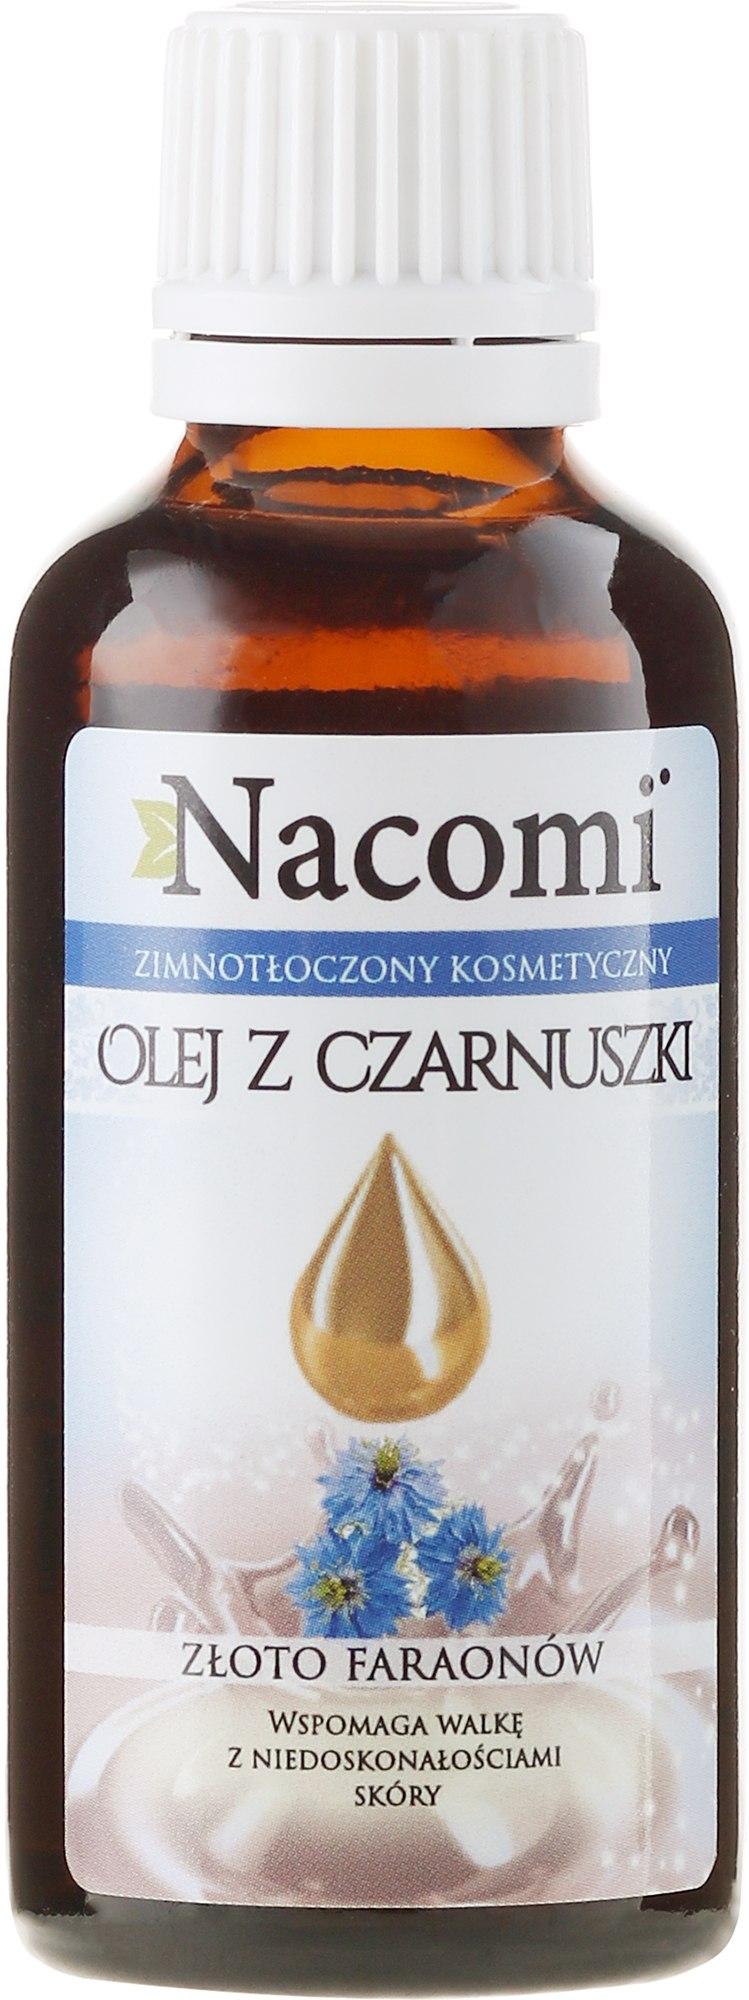 Масло от черен кимион за лице и тяло - Nacomi Olej Z Czarnuszki Złoto Faraonów — снимка 30 ml